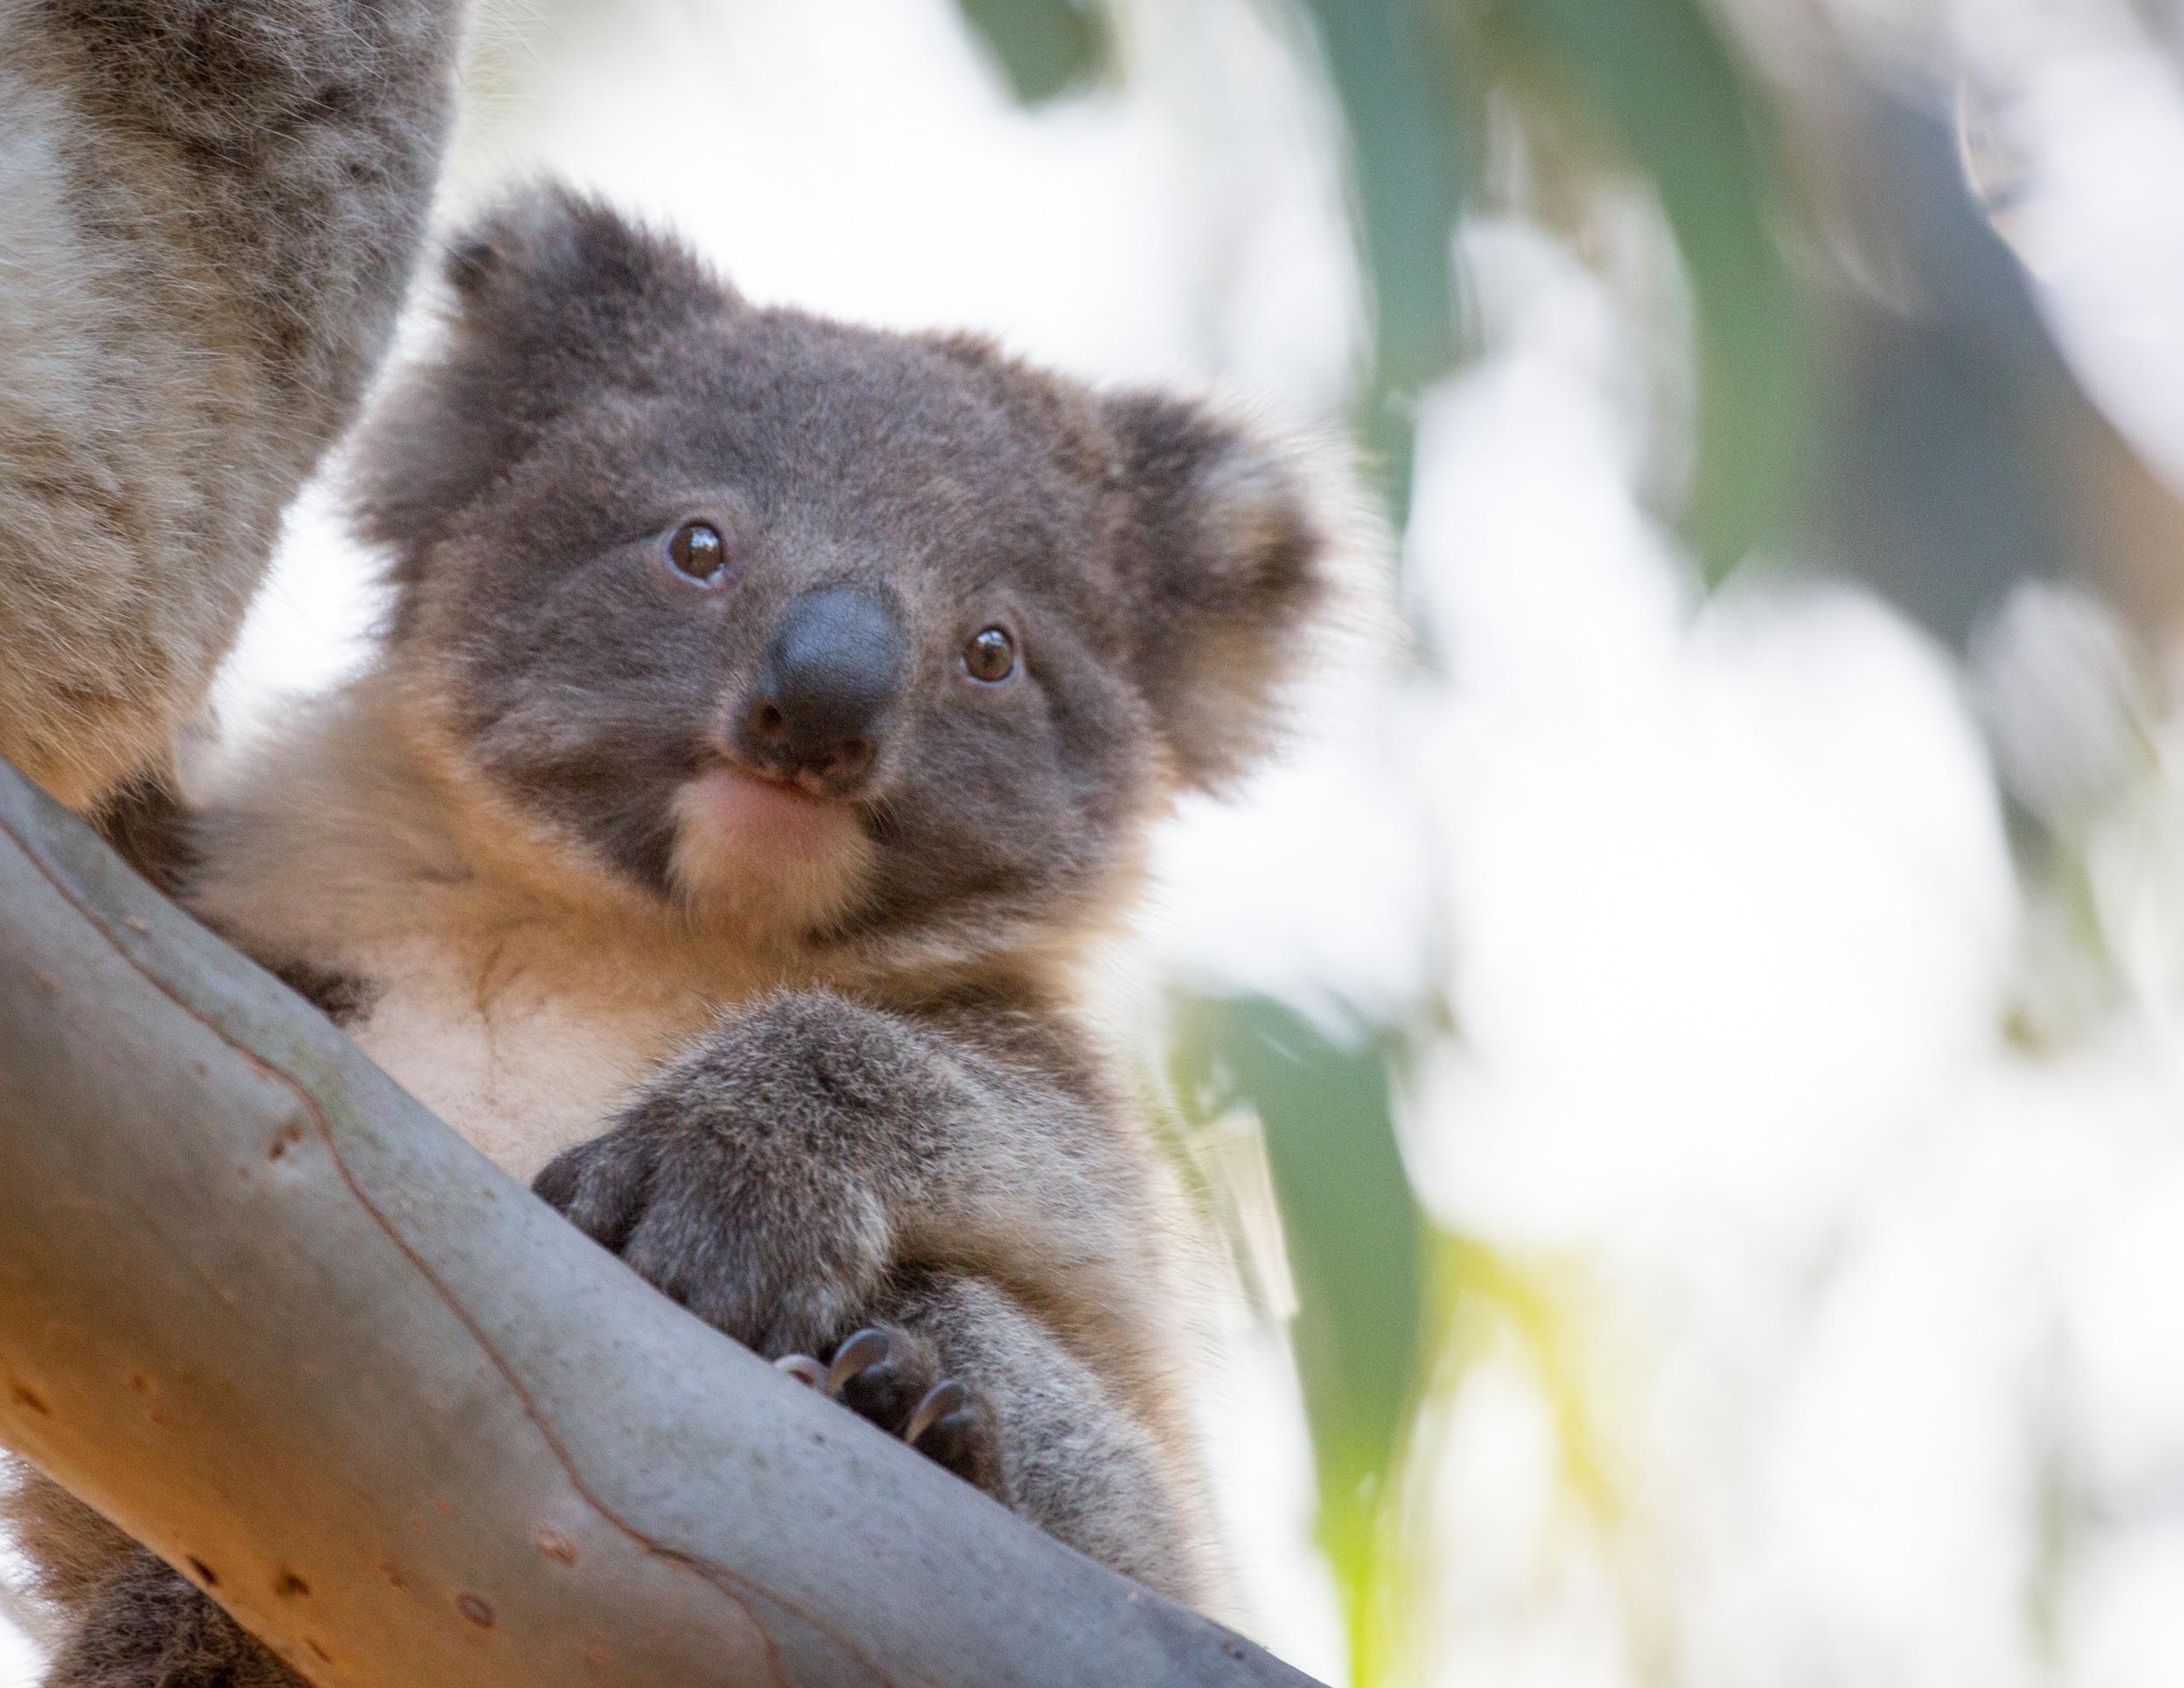 Koala in Flinders Chase National Park